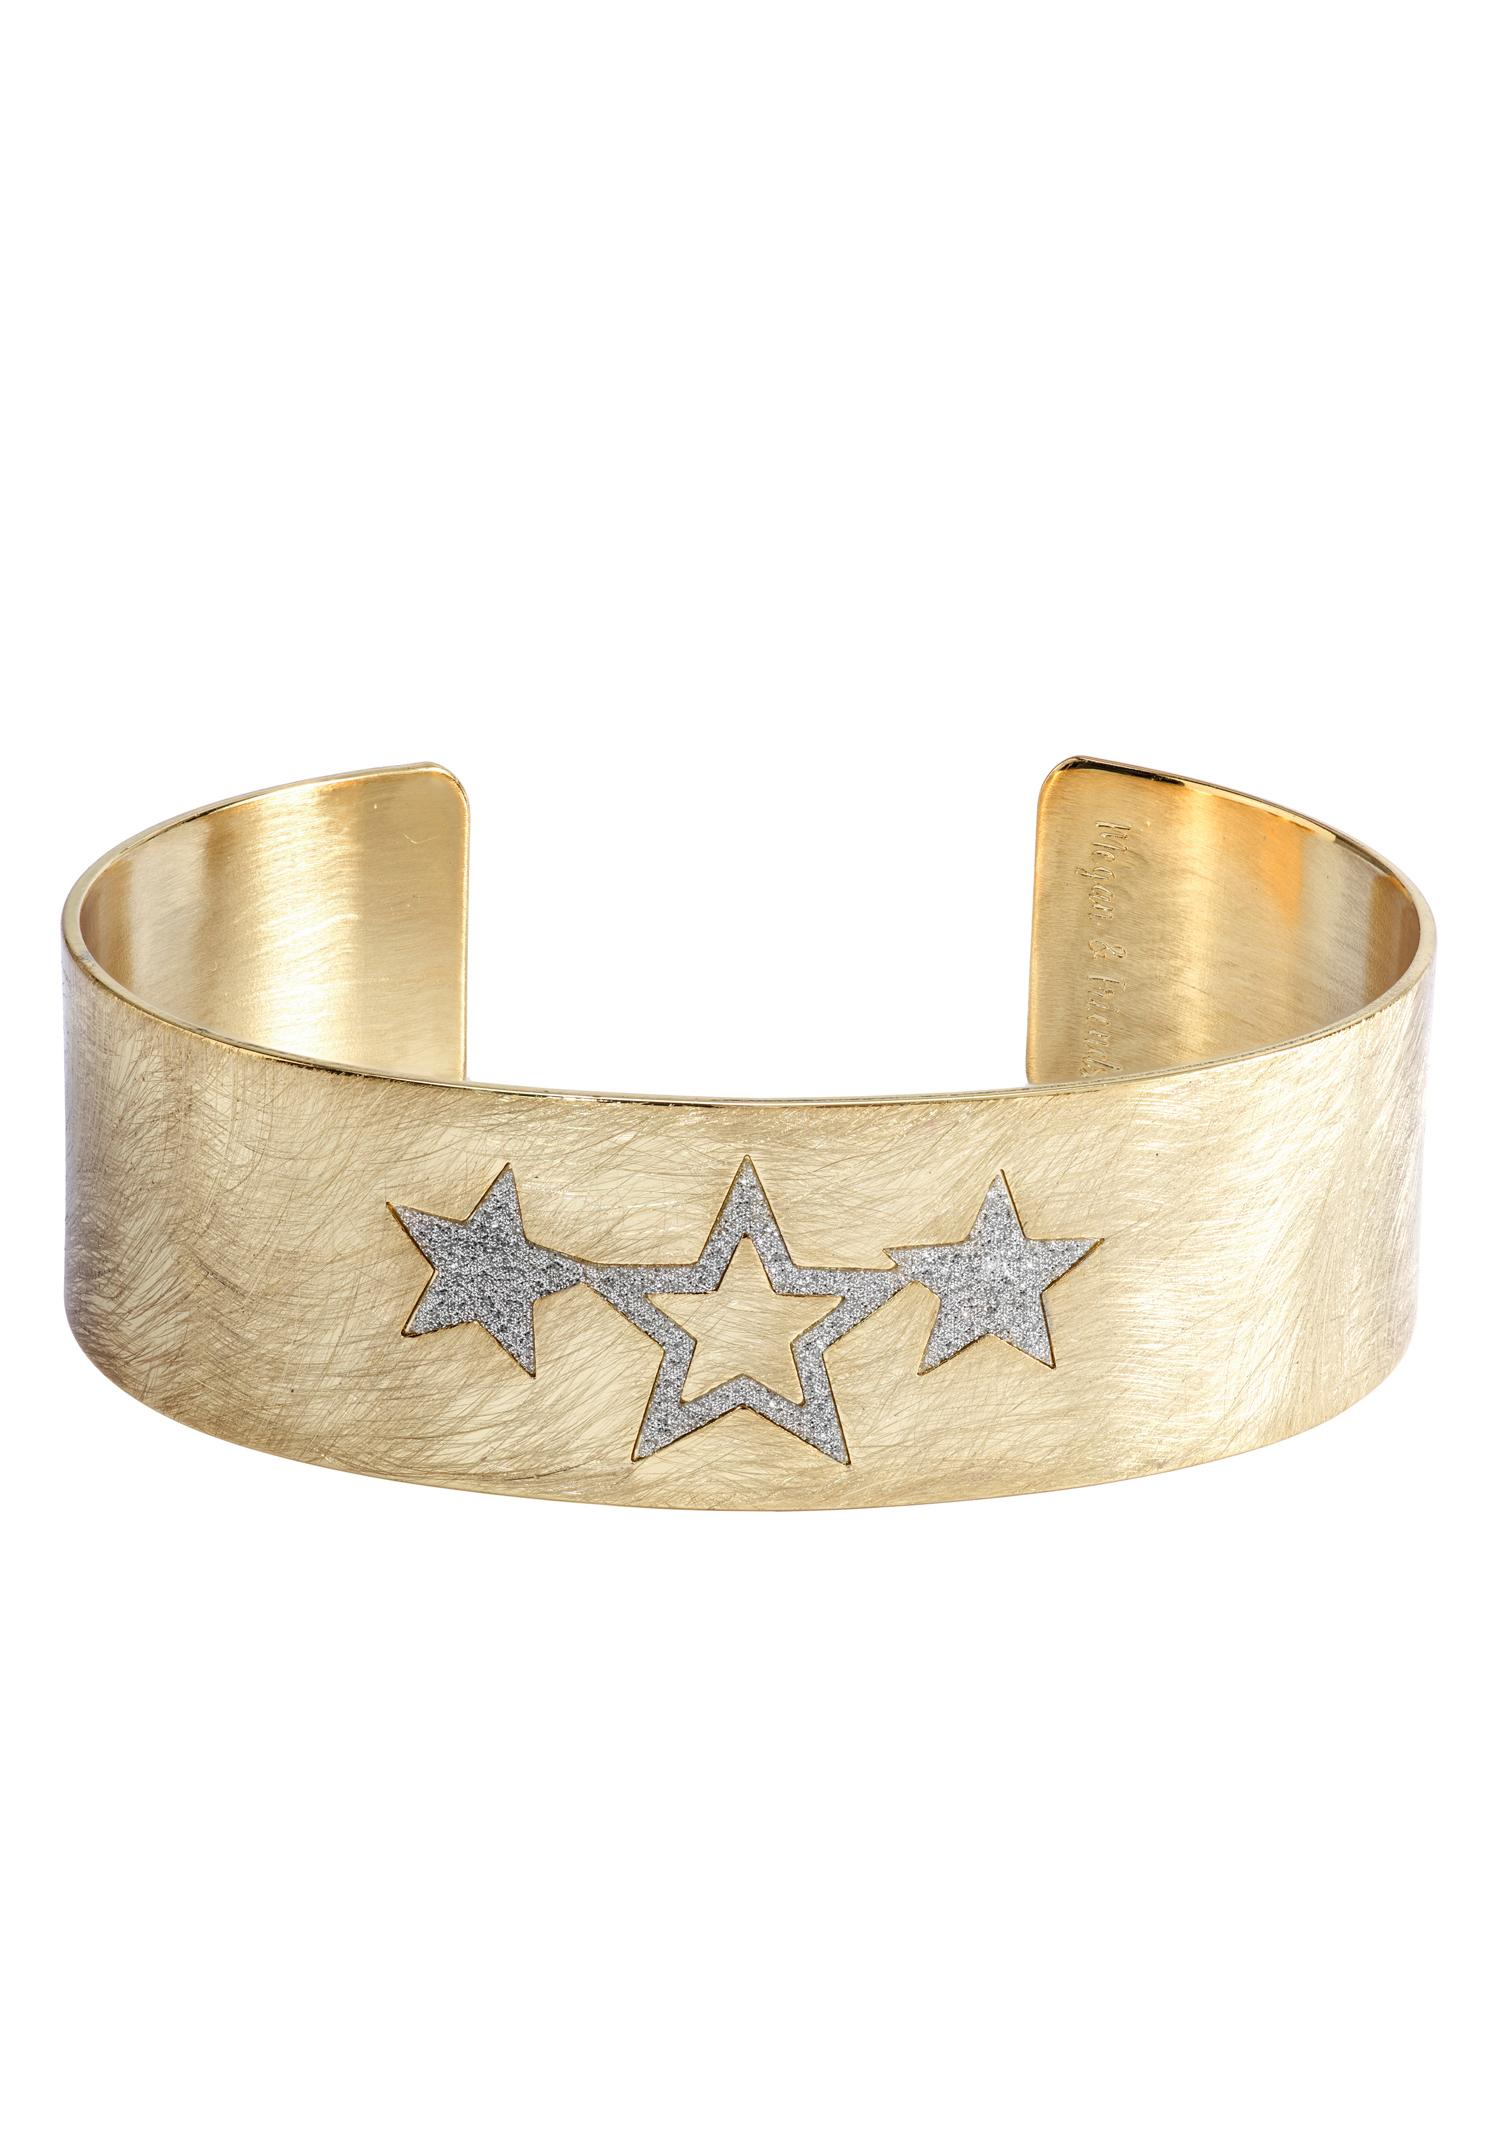 Megan & Friends Armspange STARS, Sterne, MF20090-02   Schmuck > Armbänder > Armspangen   Megan & Friends